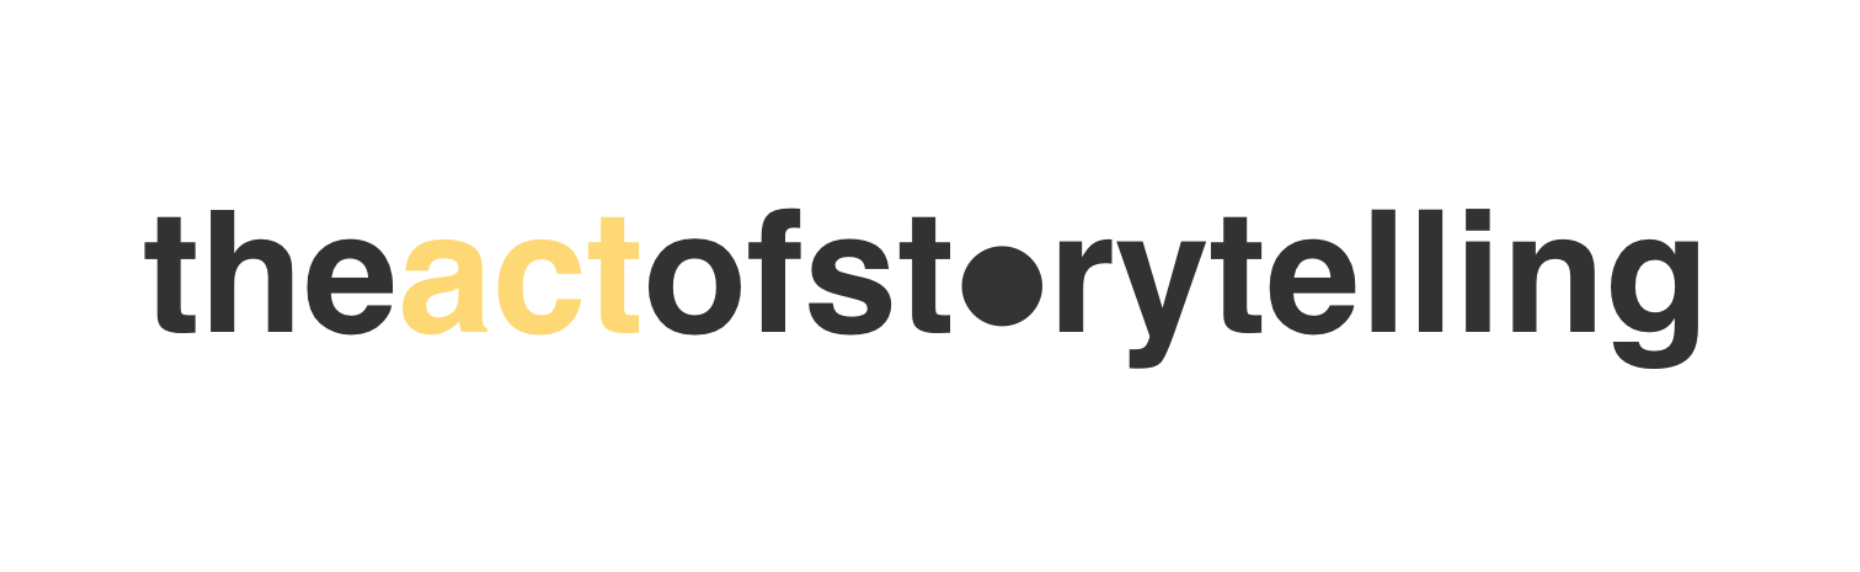 theactofstorytelling logo.png